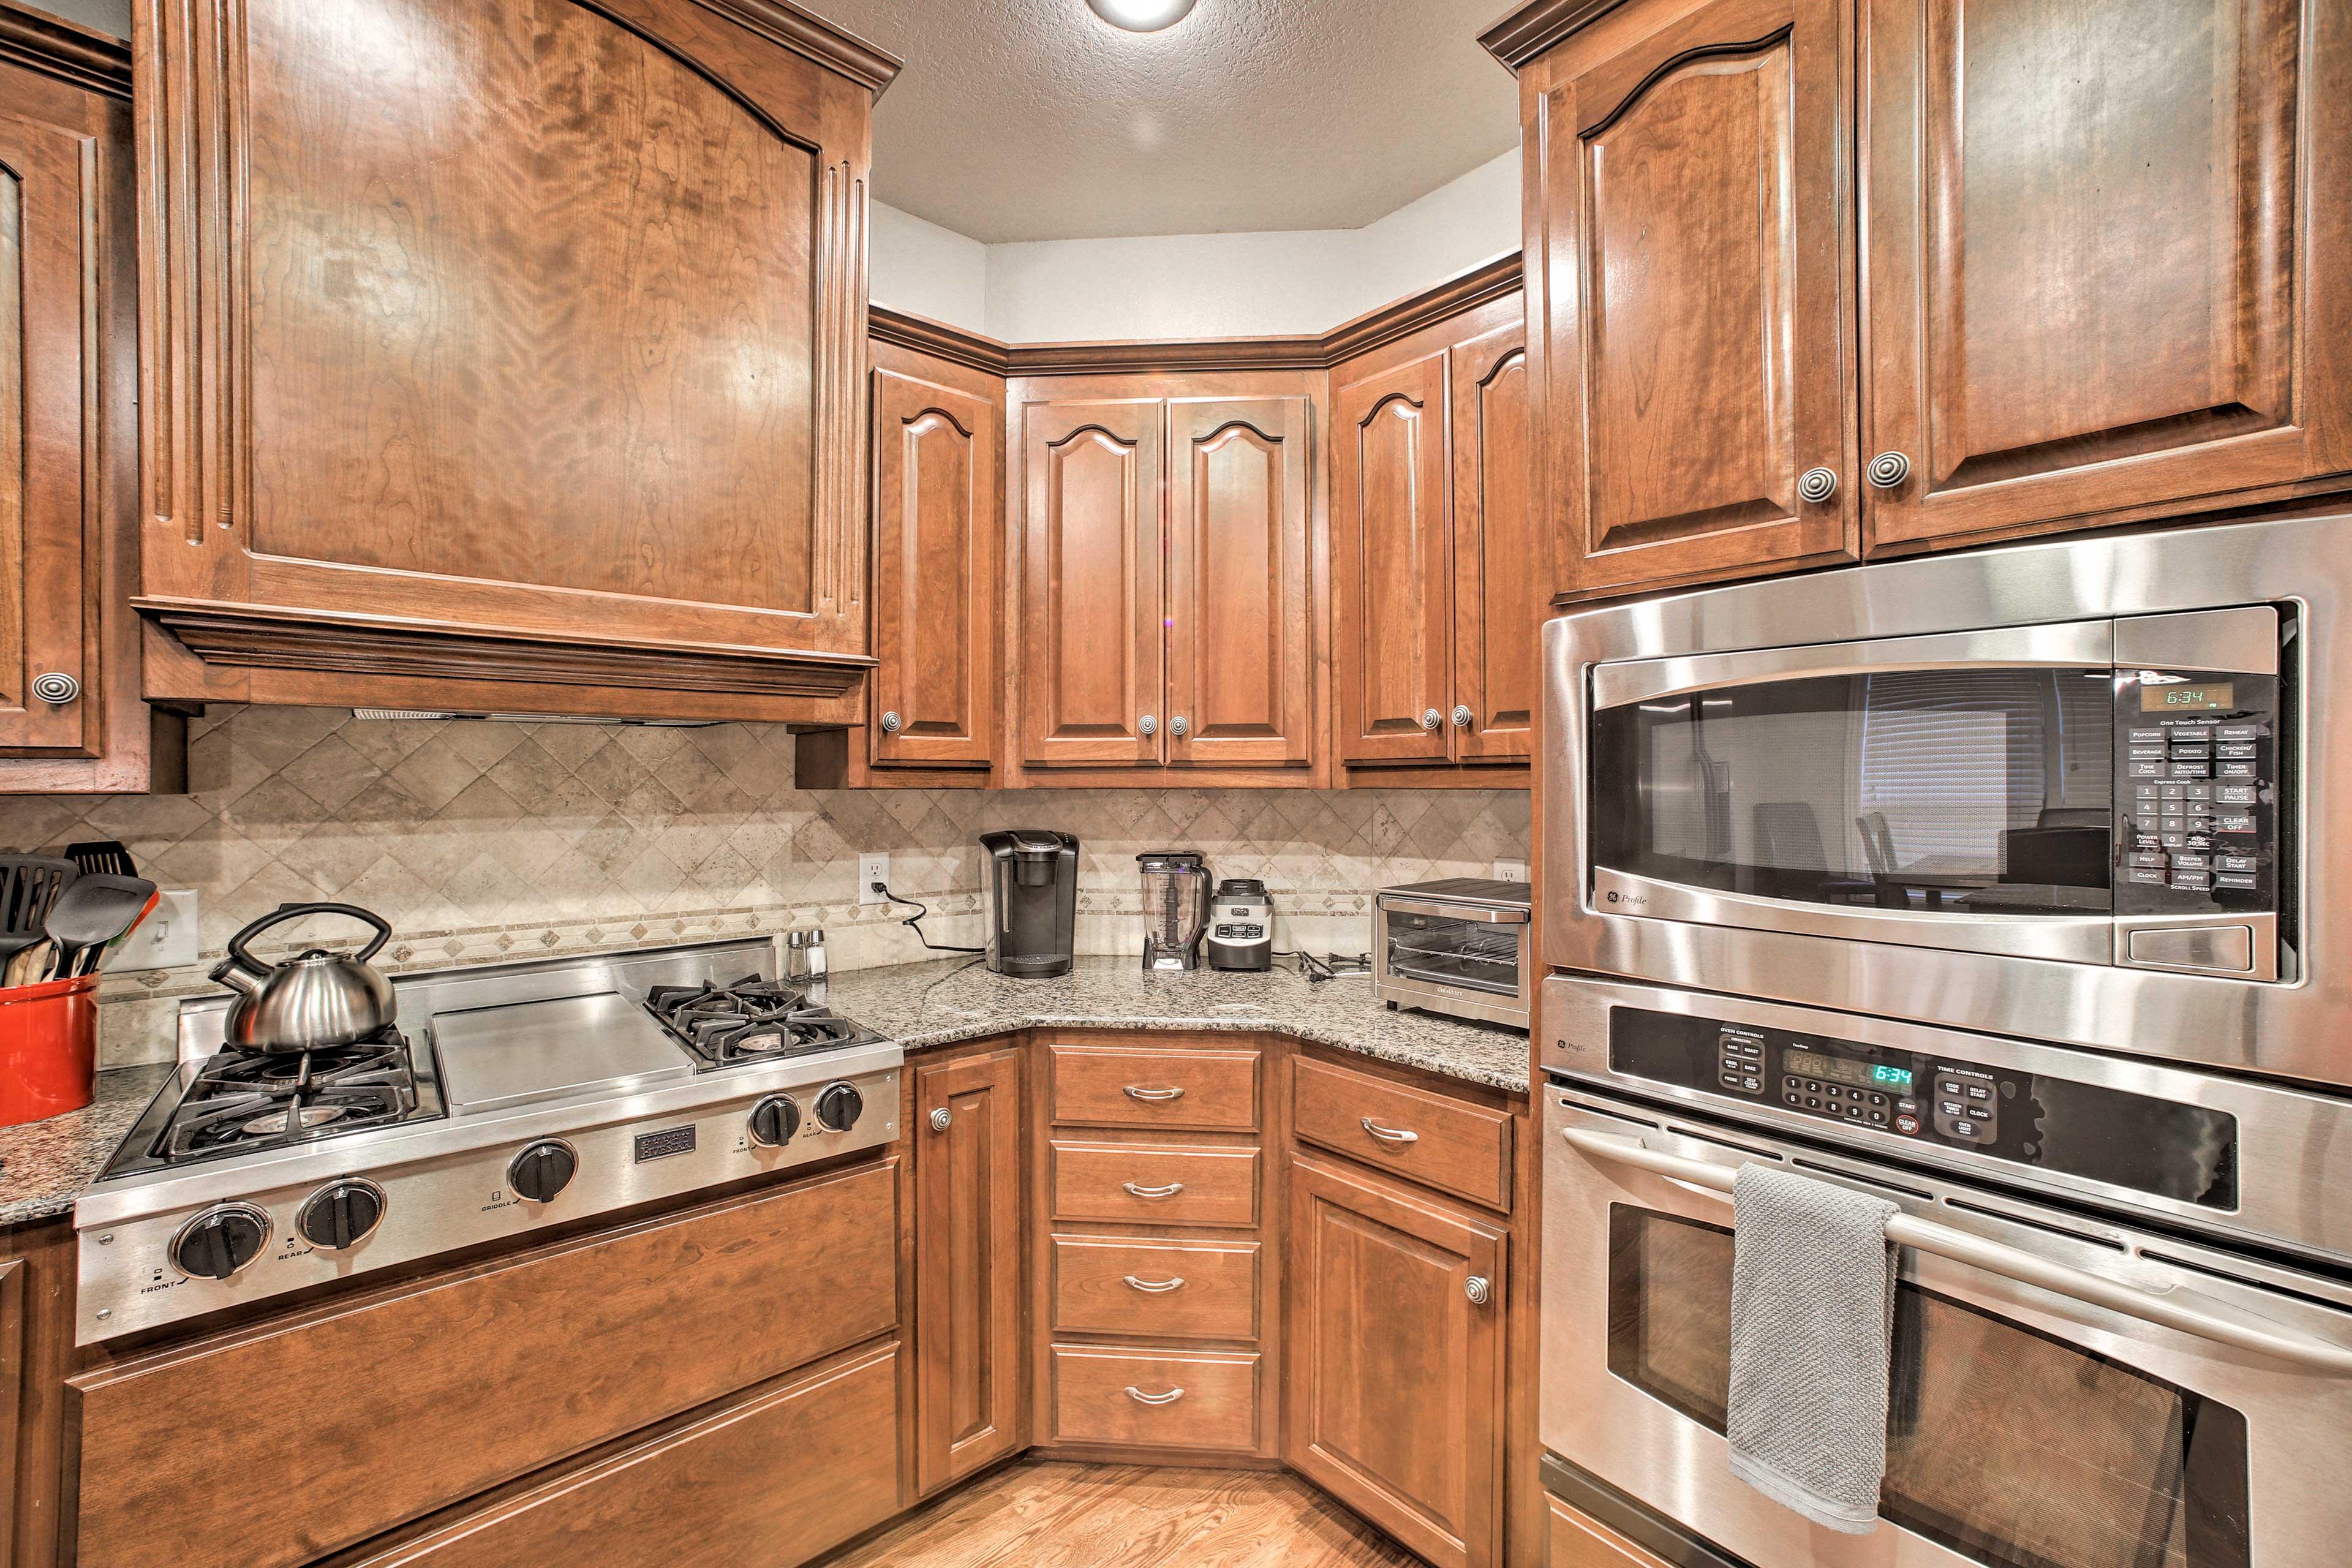 Kitchen   Stainless Steel Appliances